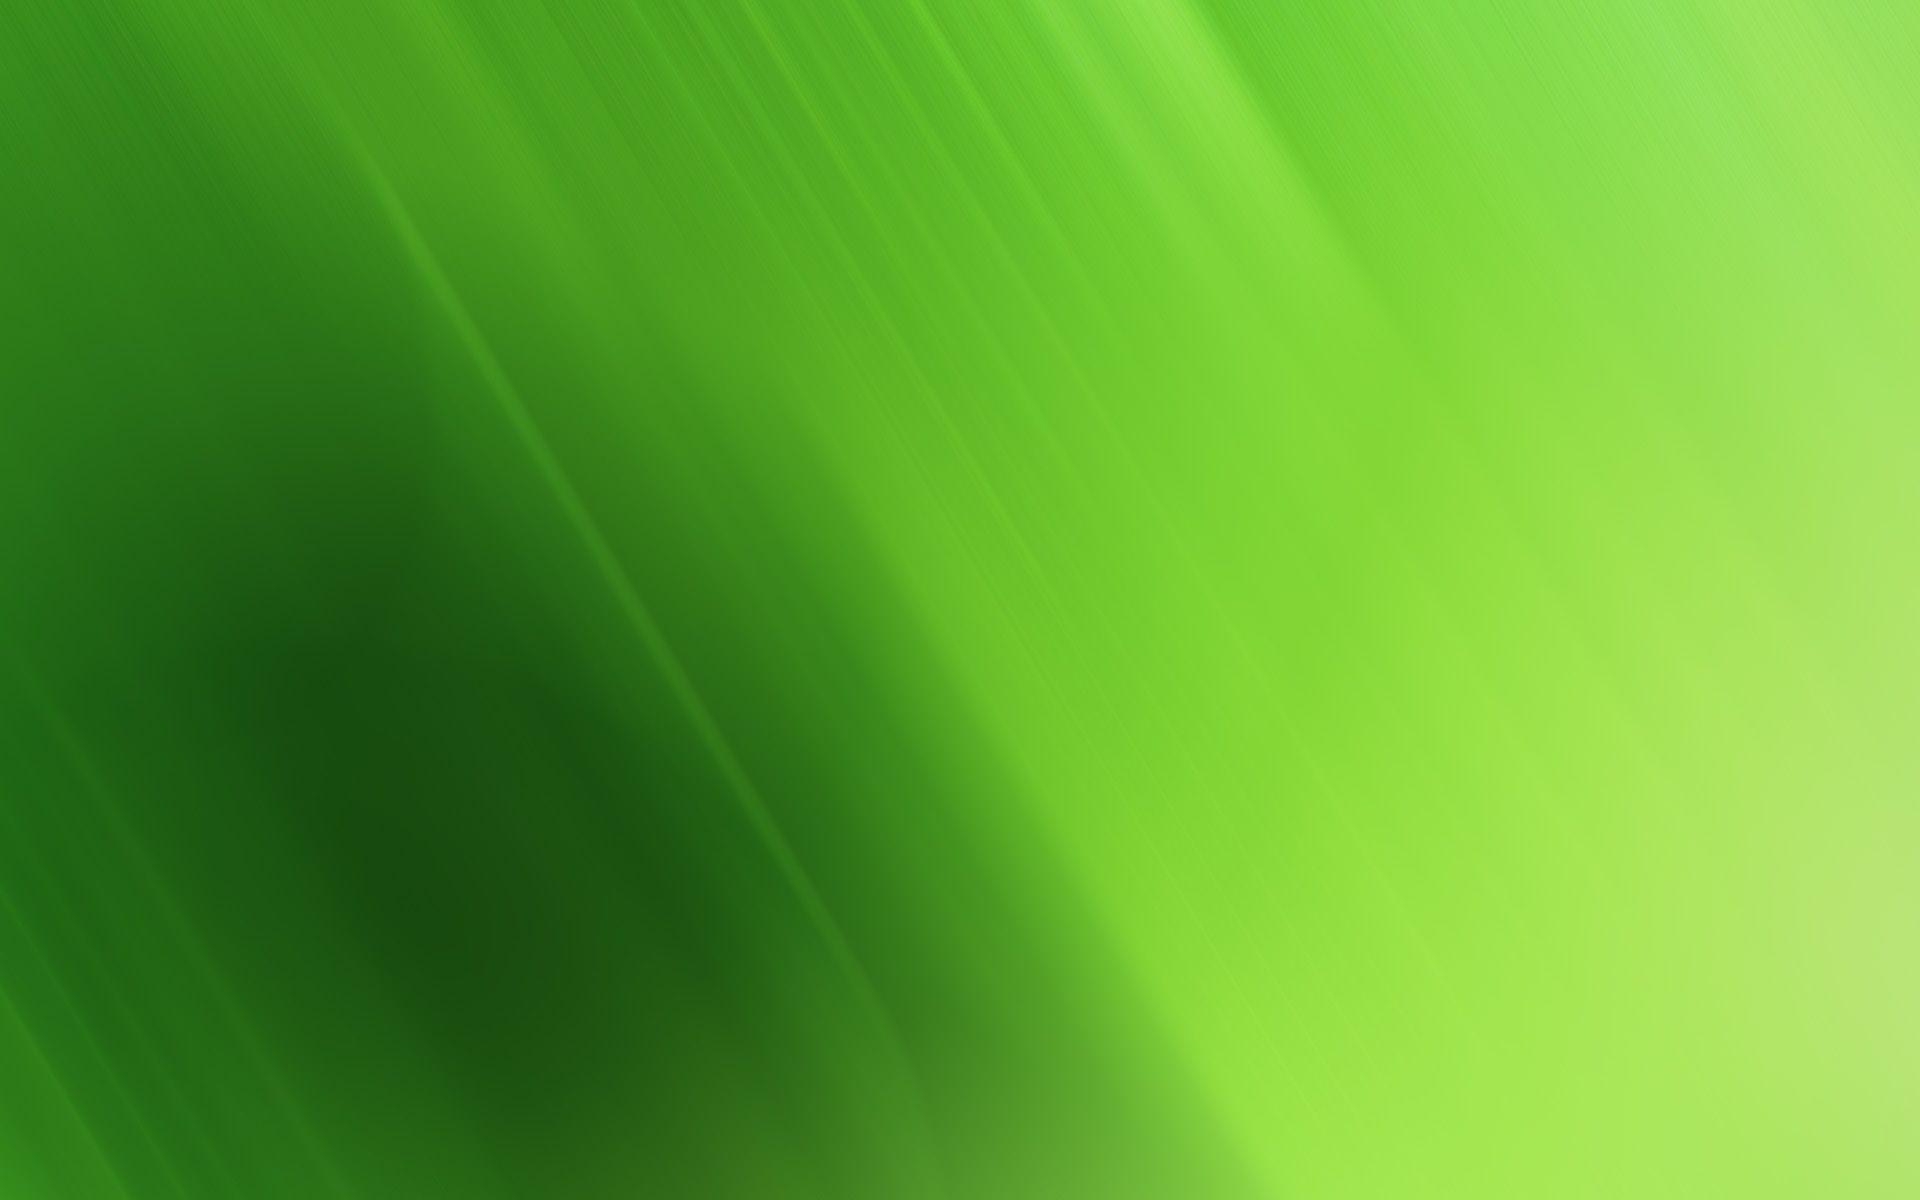 poison apple radio - hynotism: quackery or quite real? - tindeck